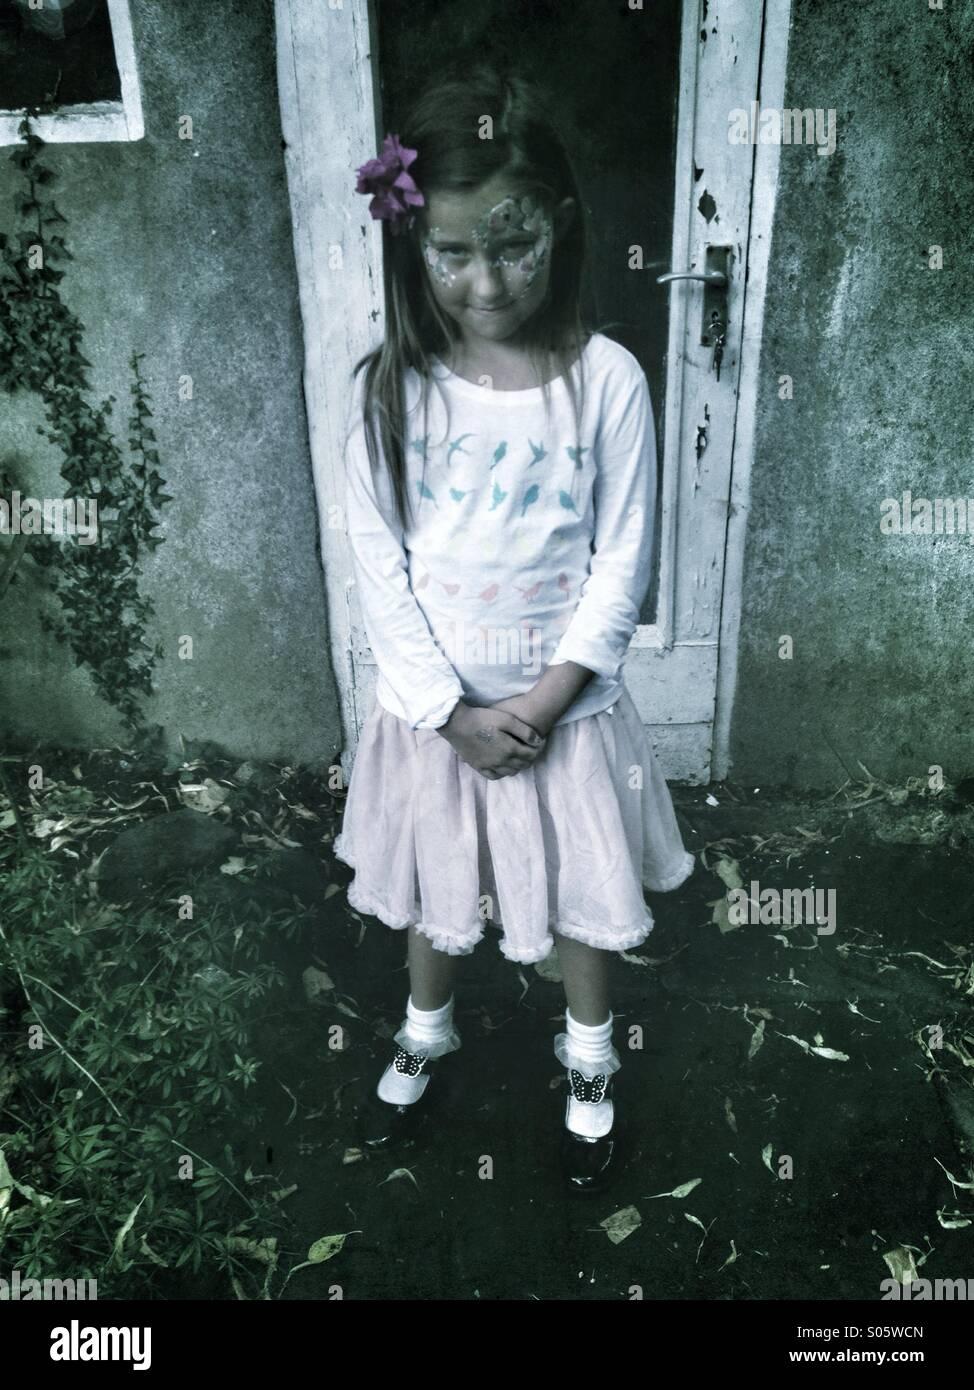 Scared girl - Stock Image